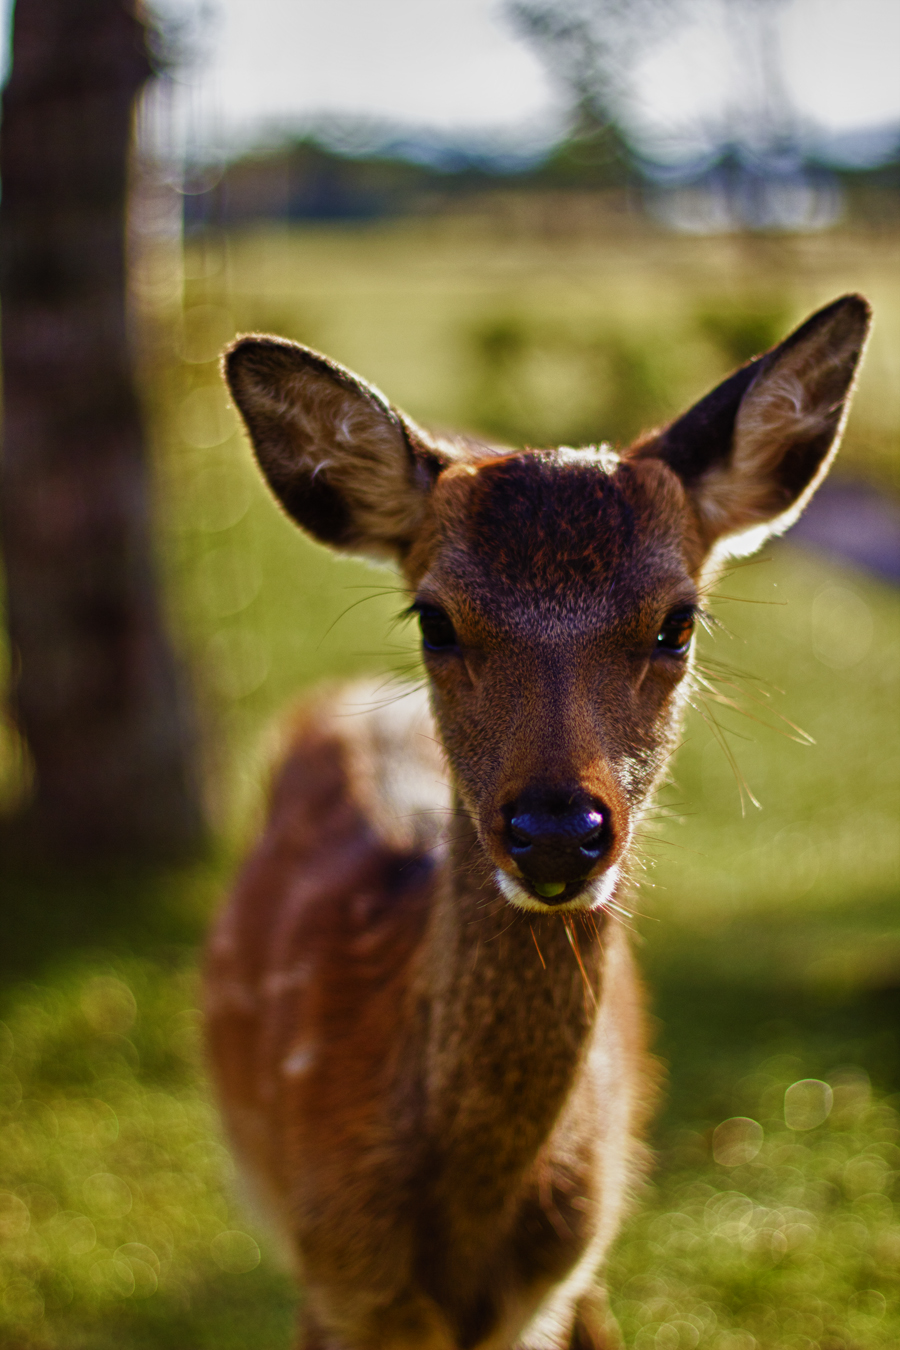 miyajima deer by Obsidian-Eyes